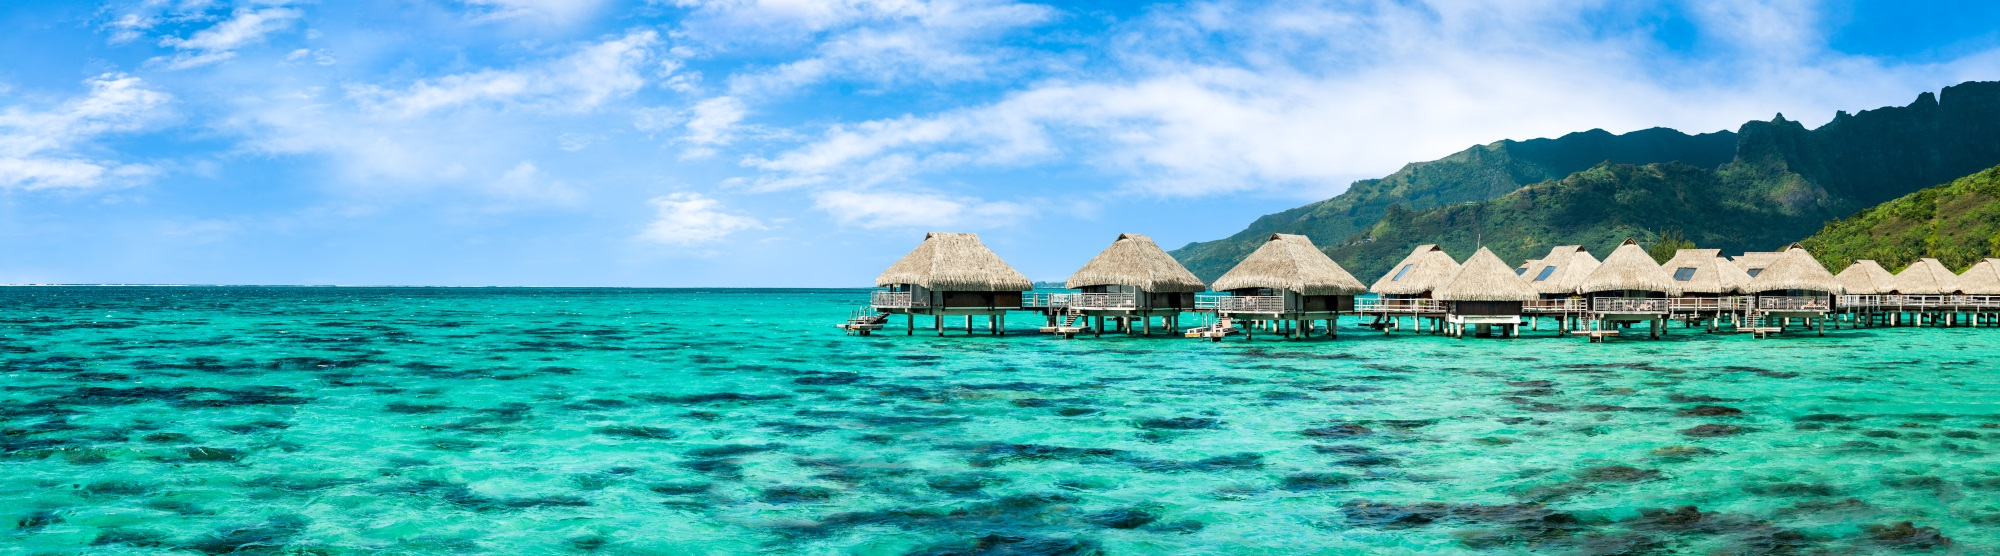 Fidschi Panorama Südsee